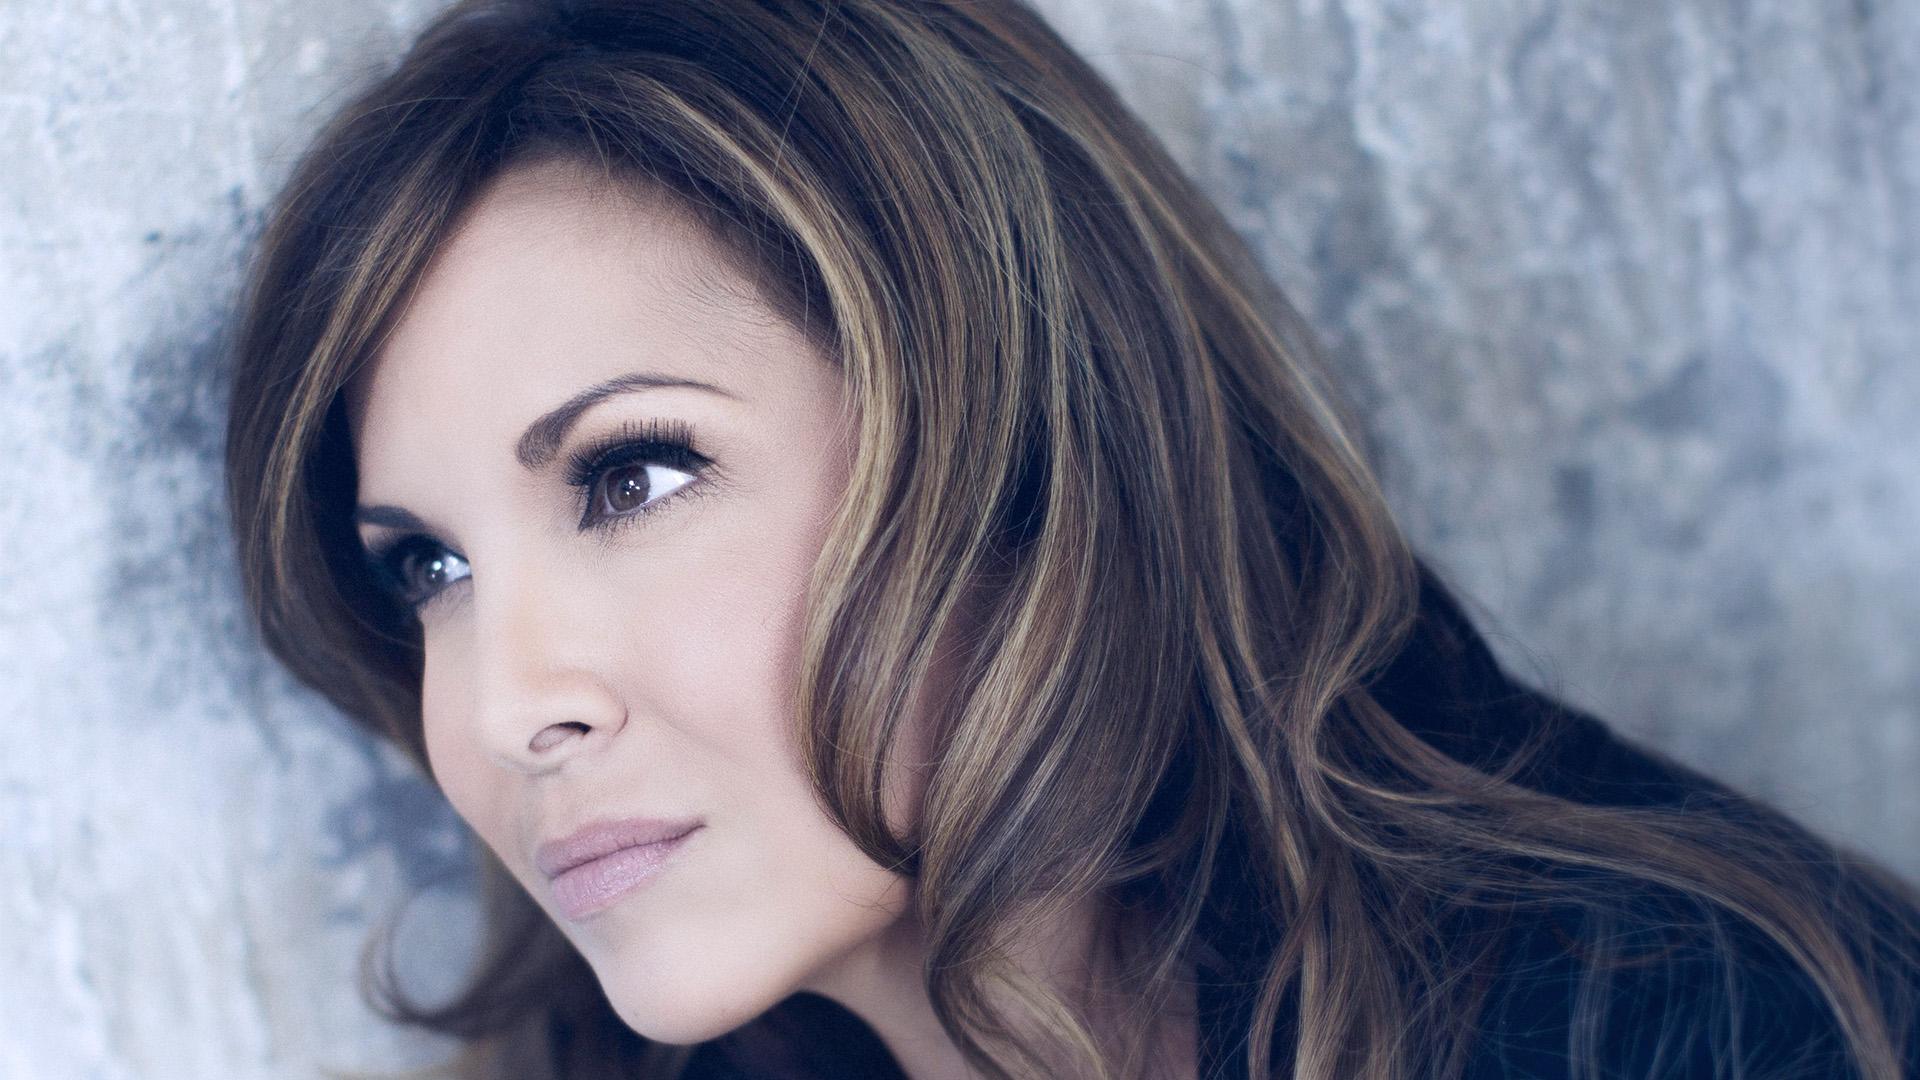 Helene Segara 演唱的法语歌曲 Encore une fois - 纽约文摘 - 纽约文摘